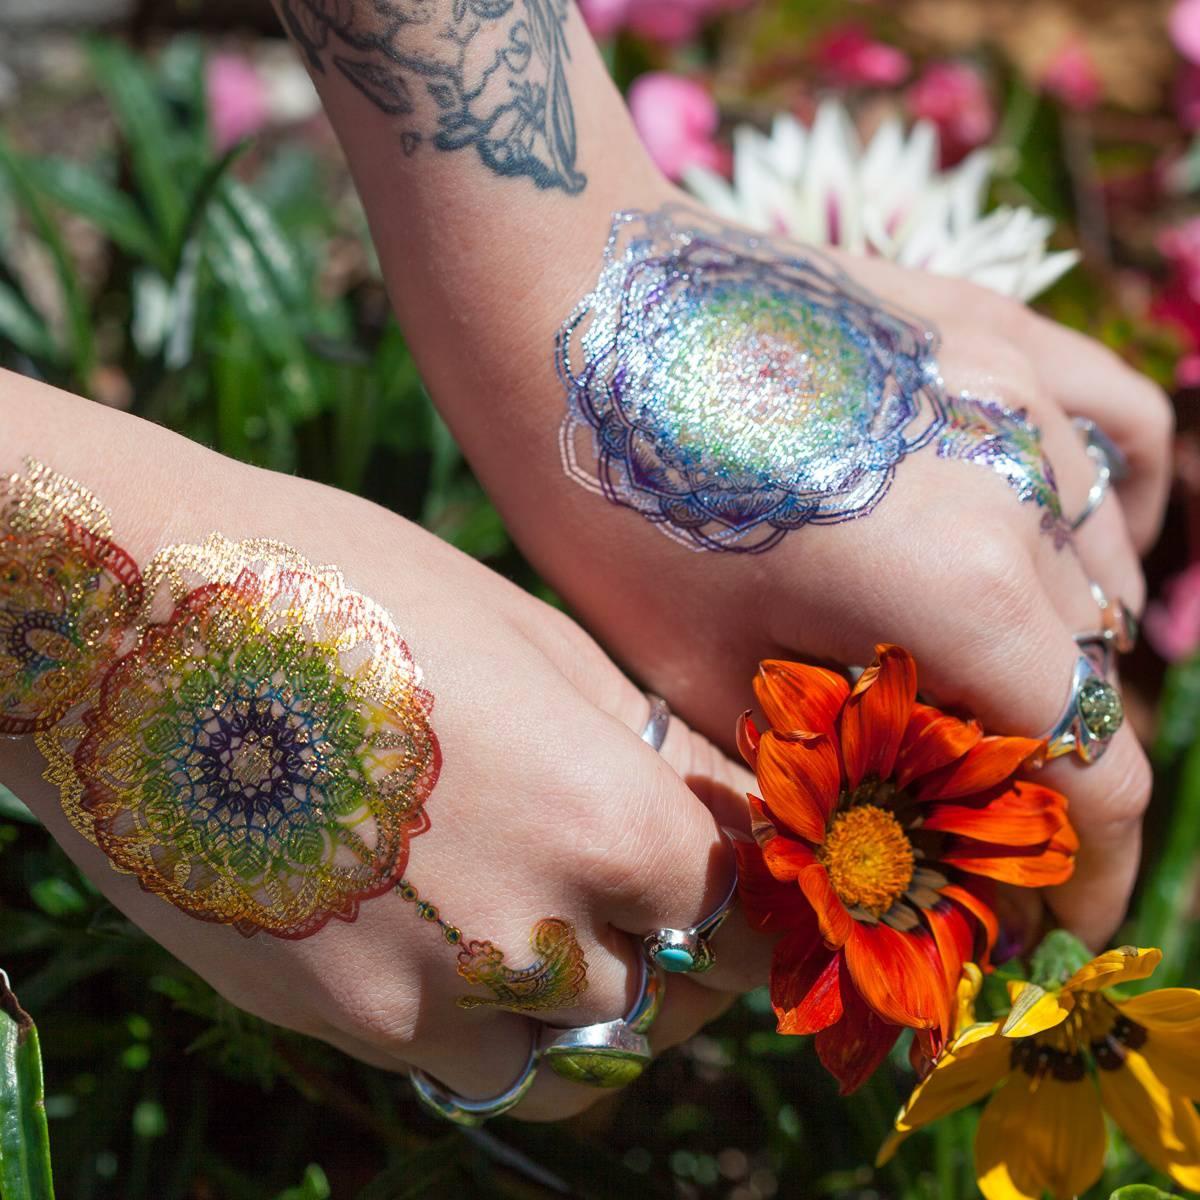 Rainbow_Metallic_Tattoo_2_Pack_2of2_7_10